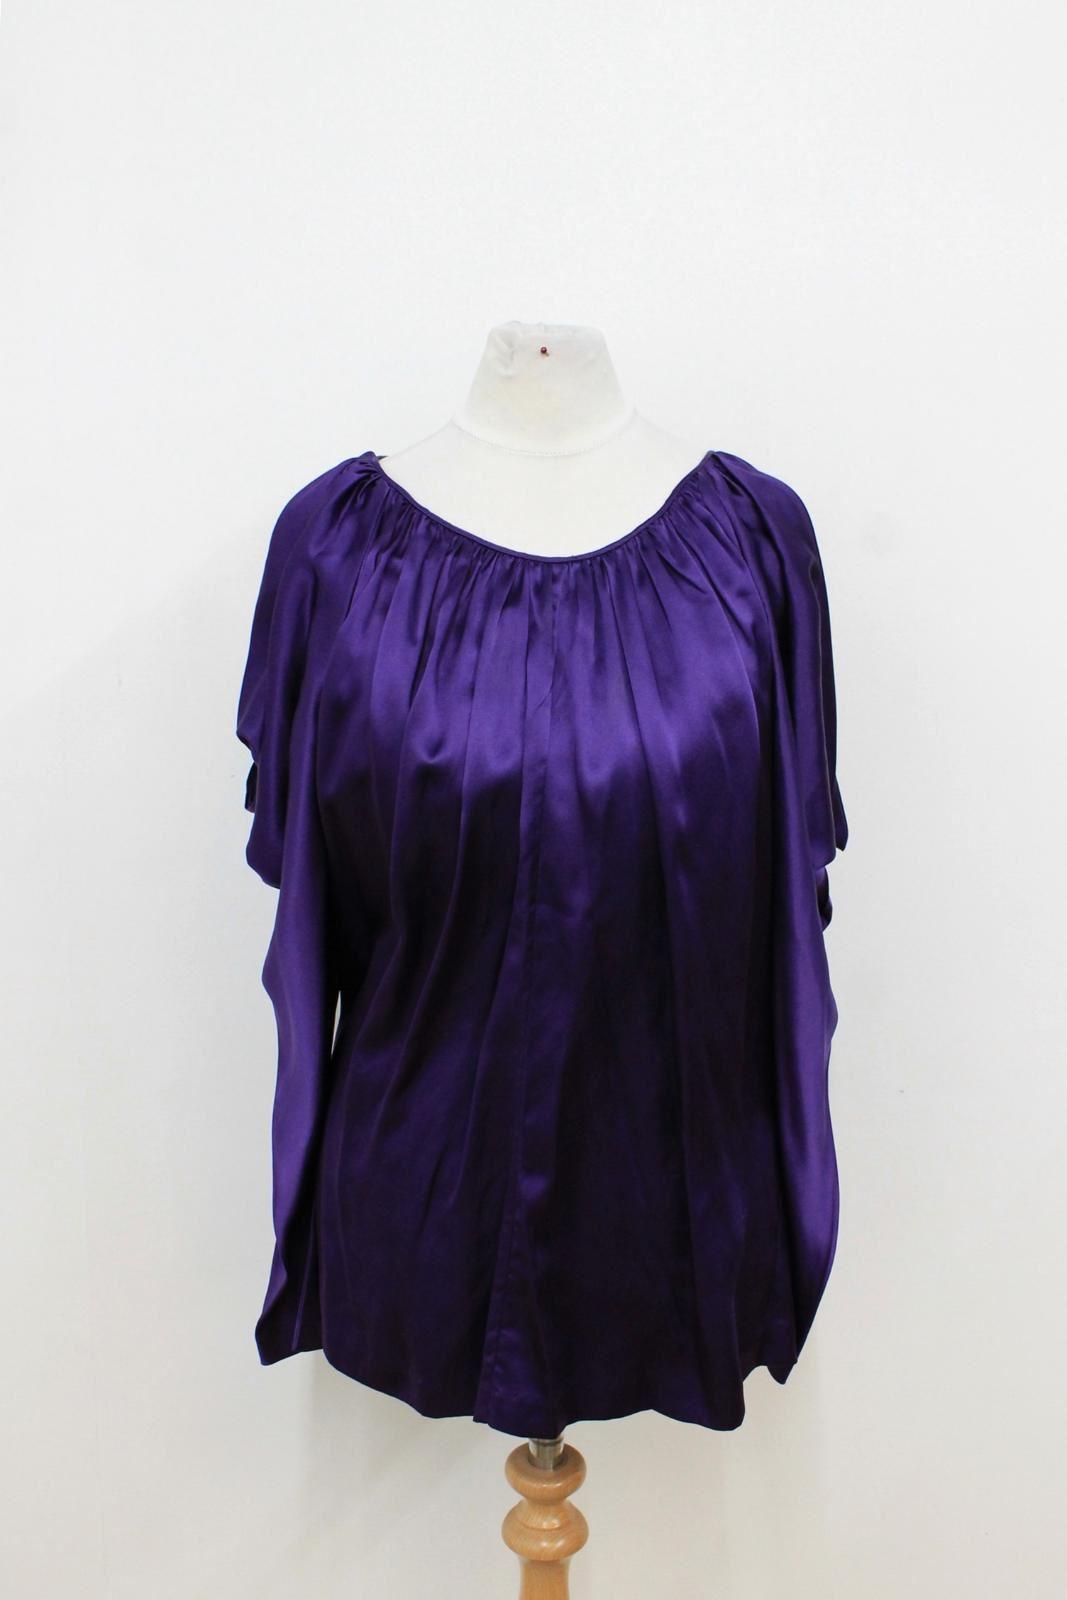 JAY GODFREY donna viola Seta spalle fredde a maniche lunghe Blusa Taglia US6 UK10